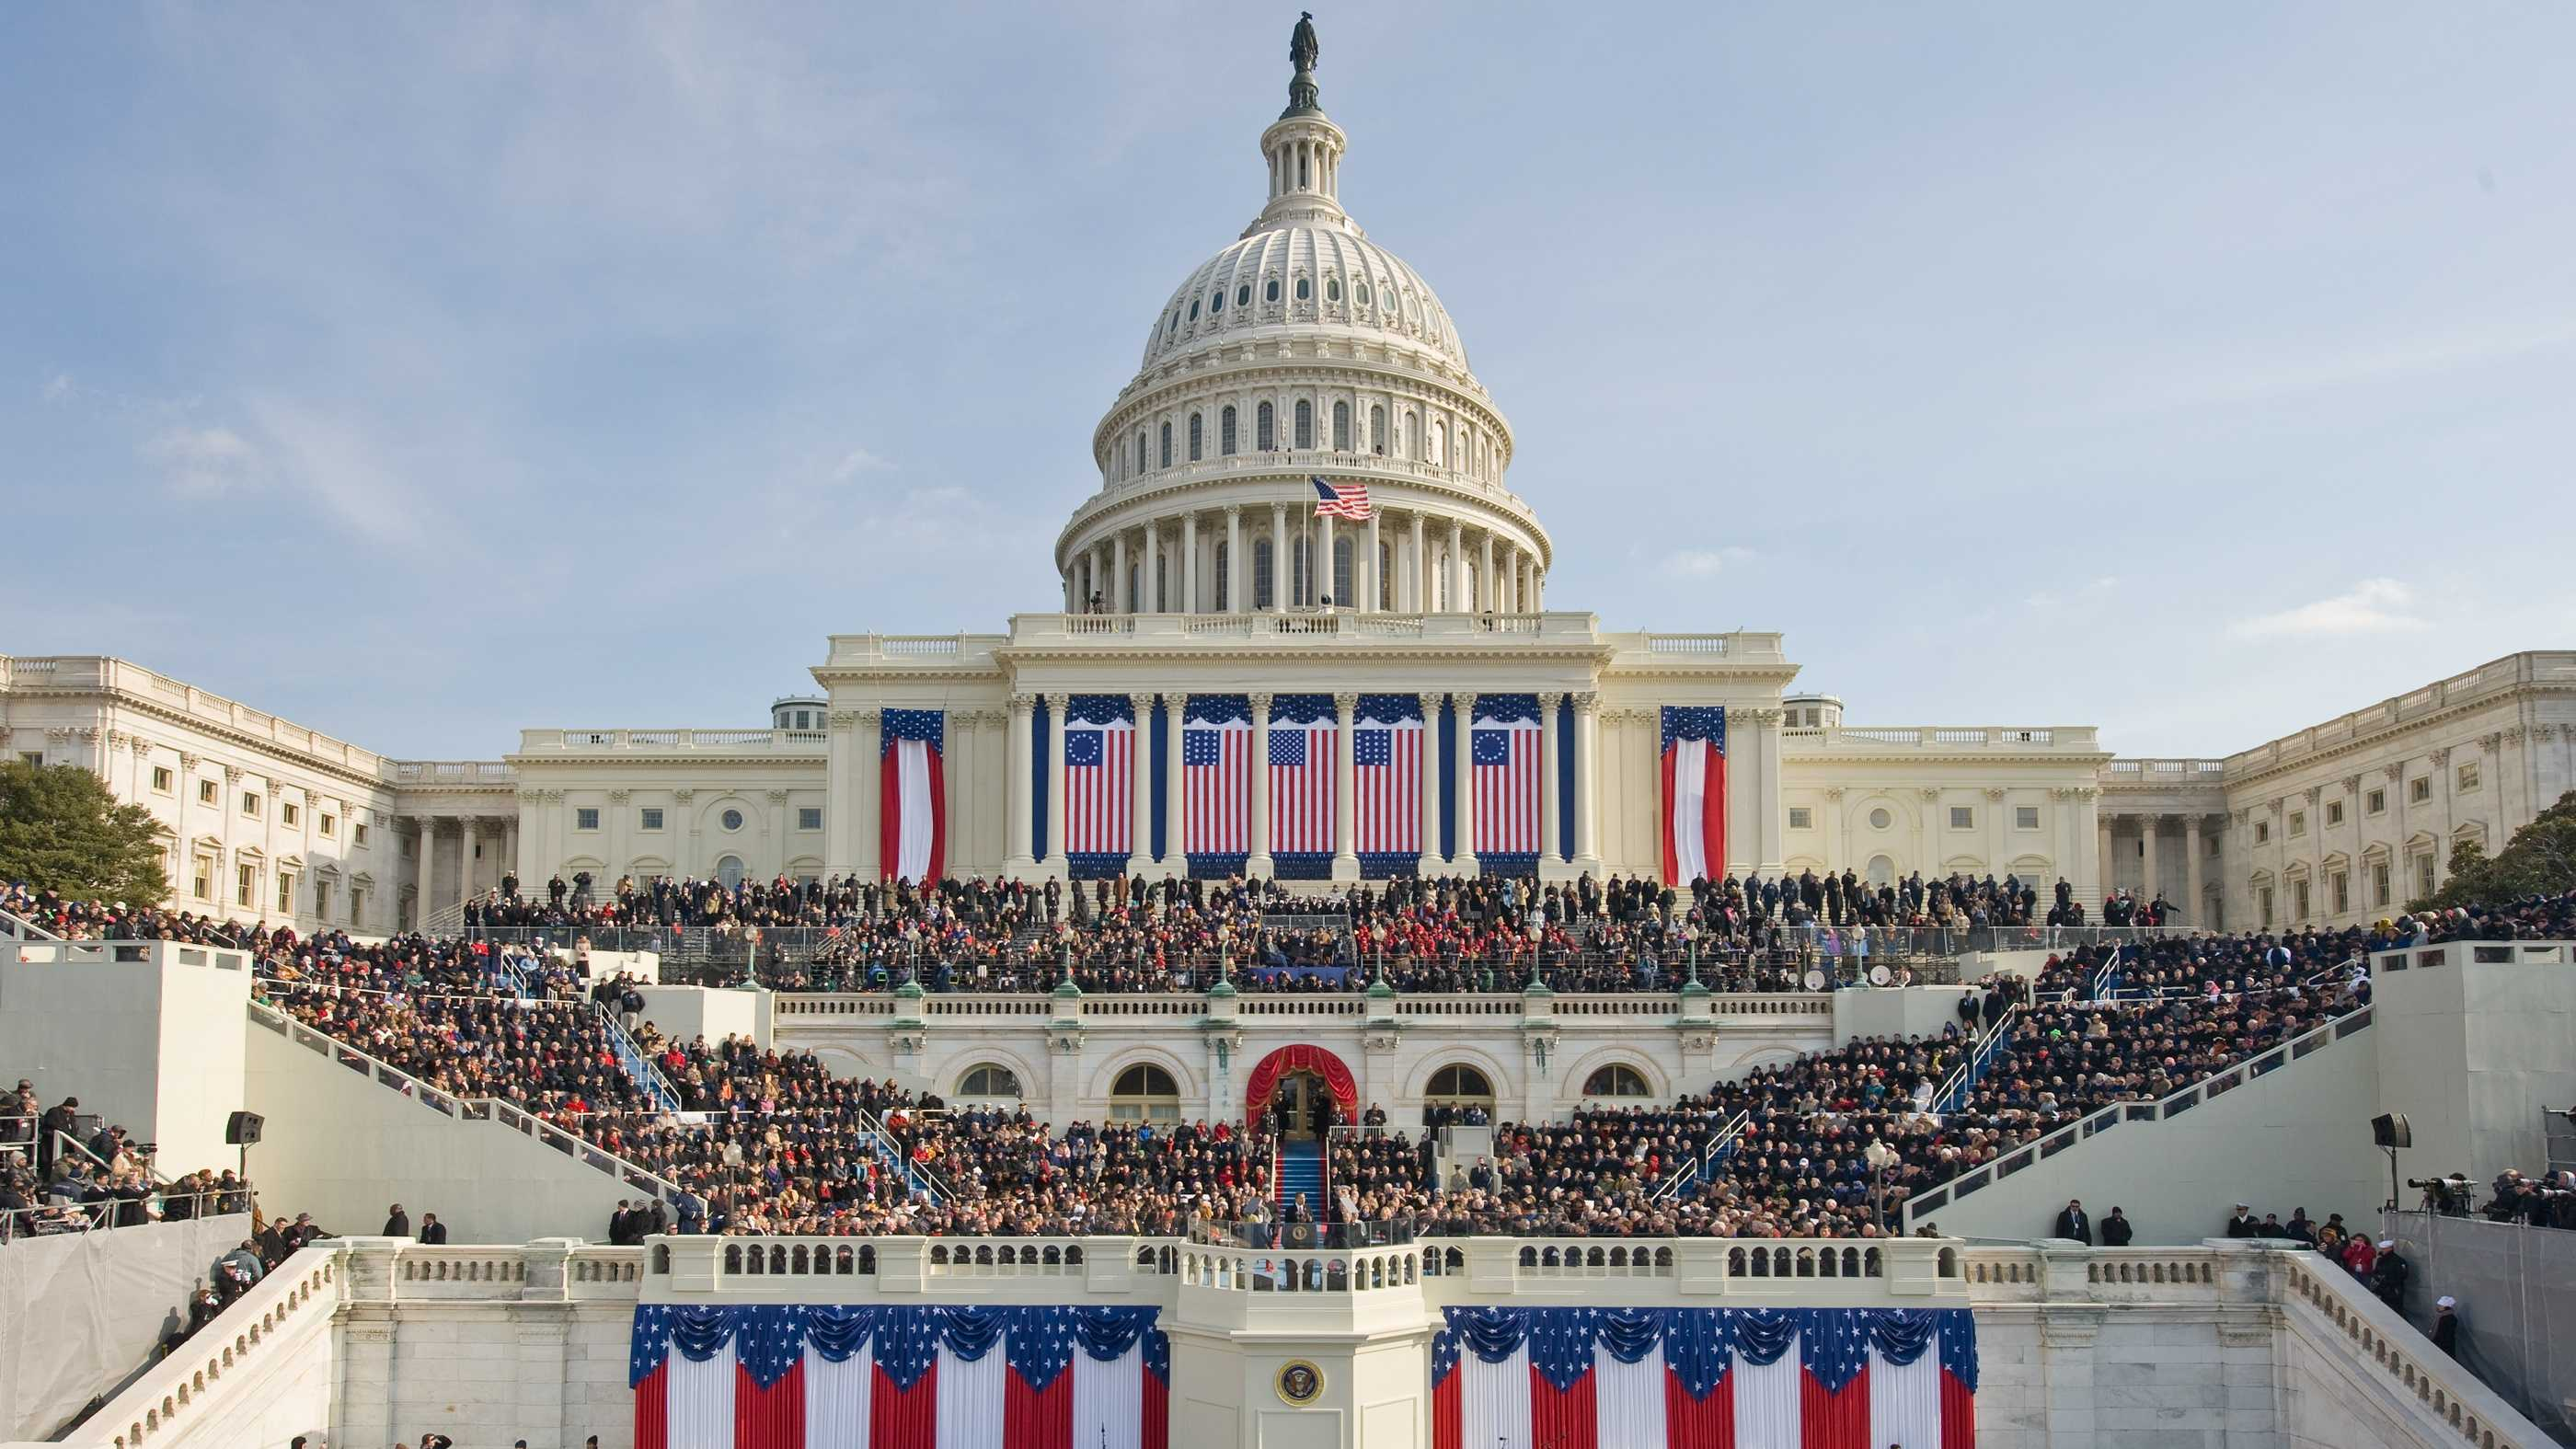 012009-inauguration.jpg